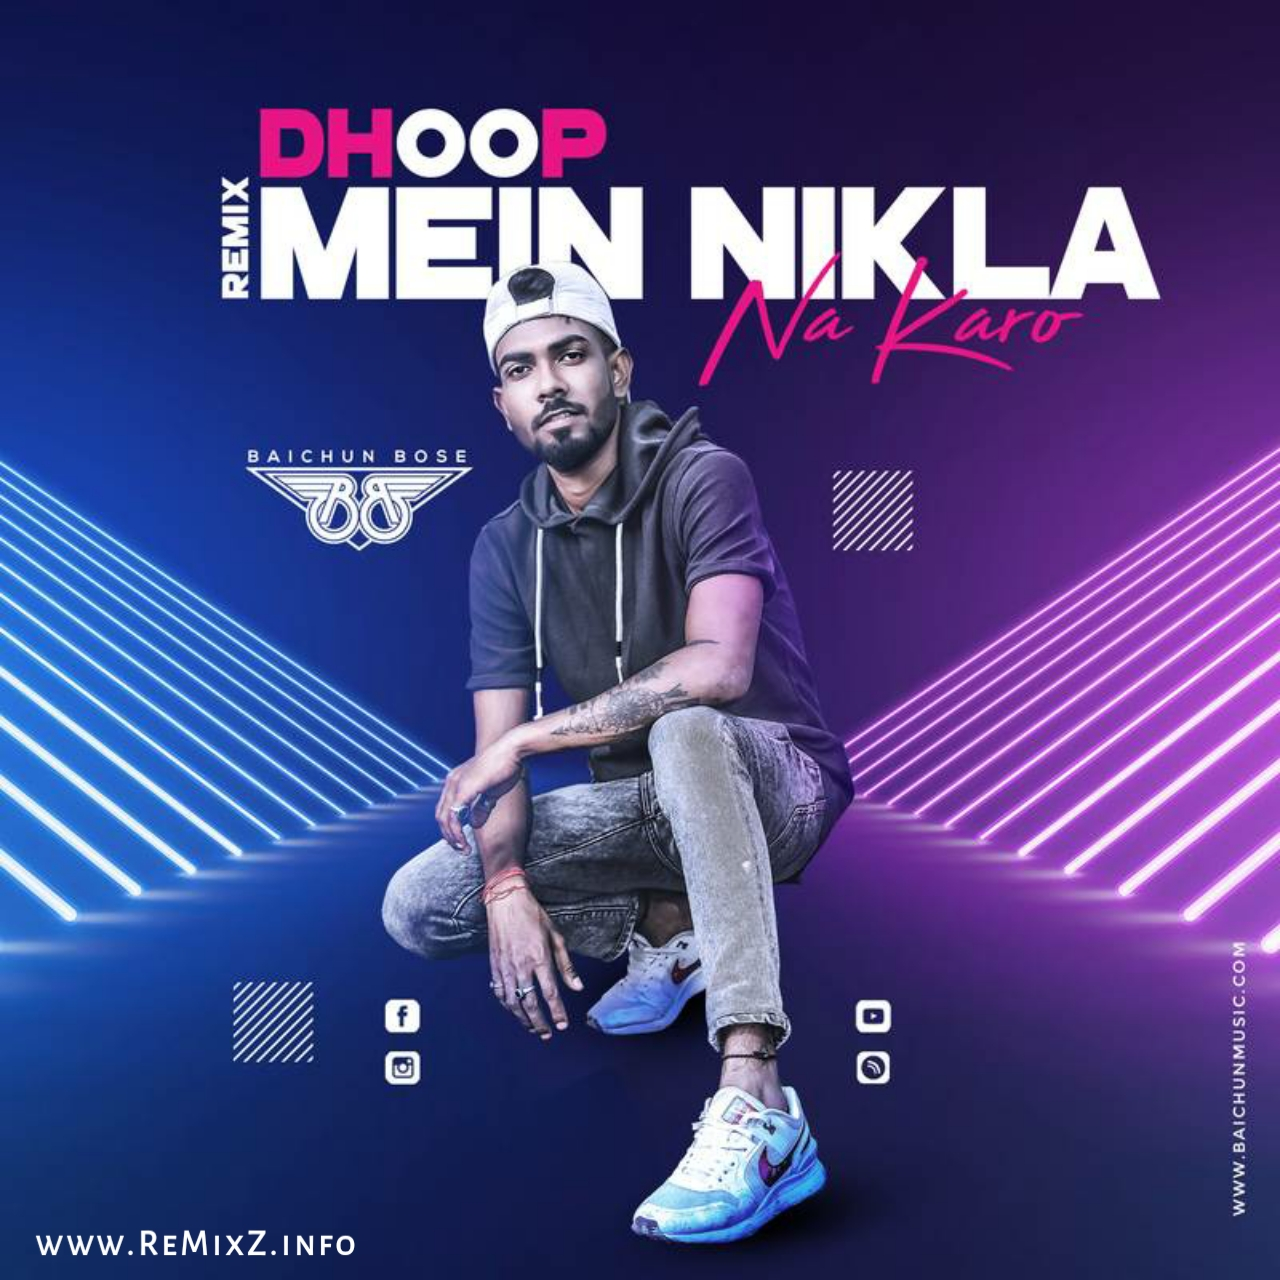 dhoop-mein-nikla-na-karo-remix-dj-baichun.jpg